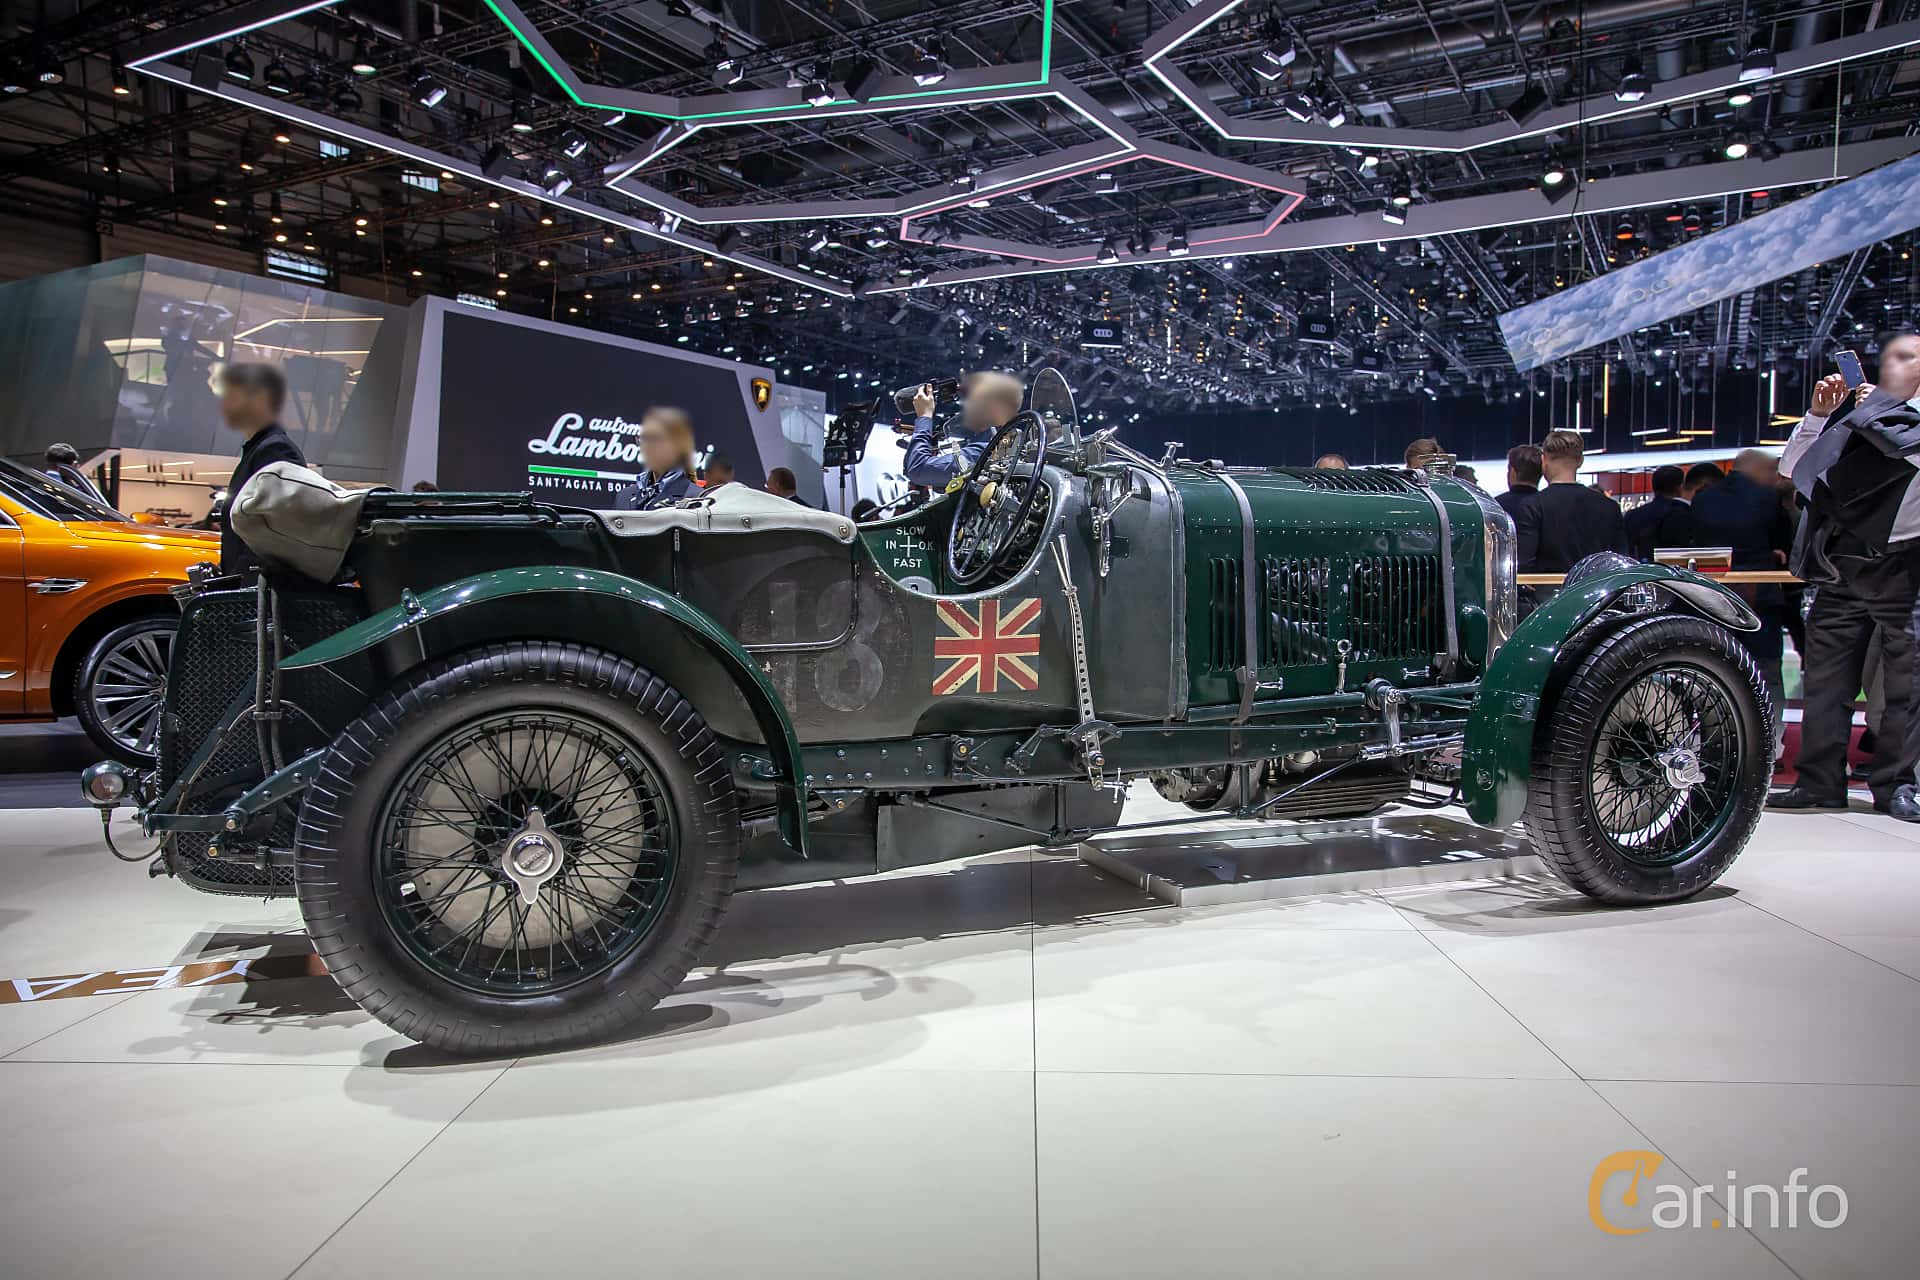 Bentley 4.5 Litre Cabriolet 4.4 Manual, 110hp, 1930 at Geneva Motor Show 2019